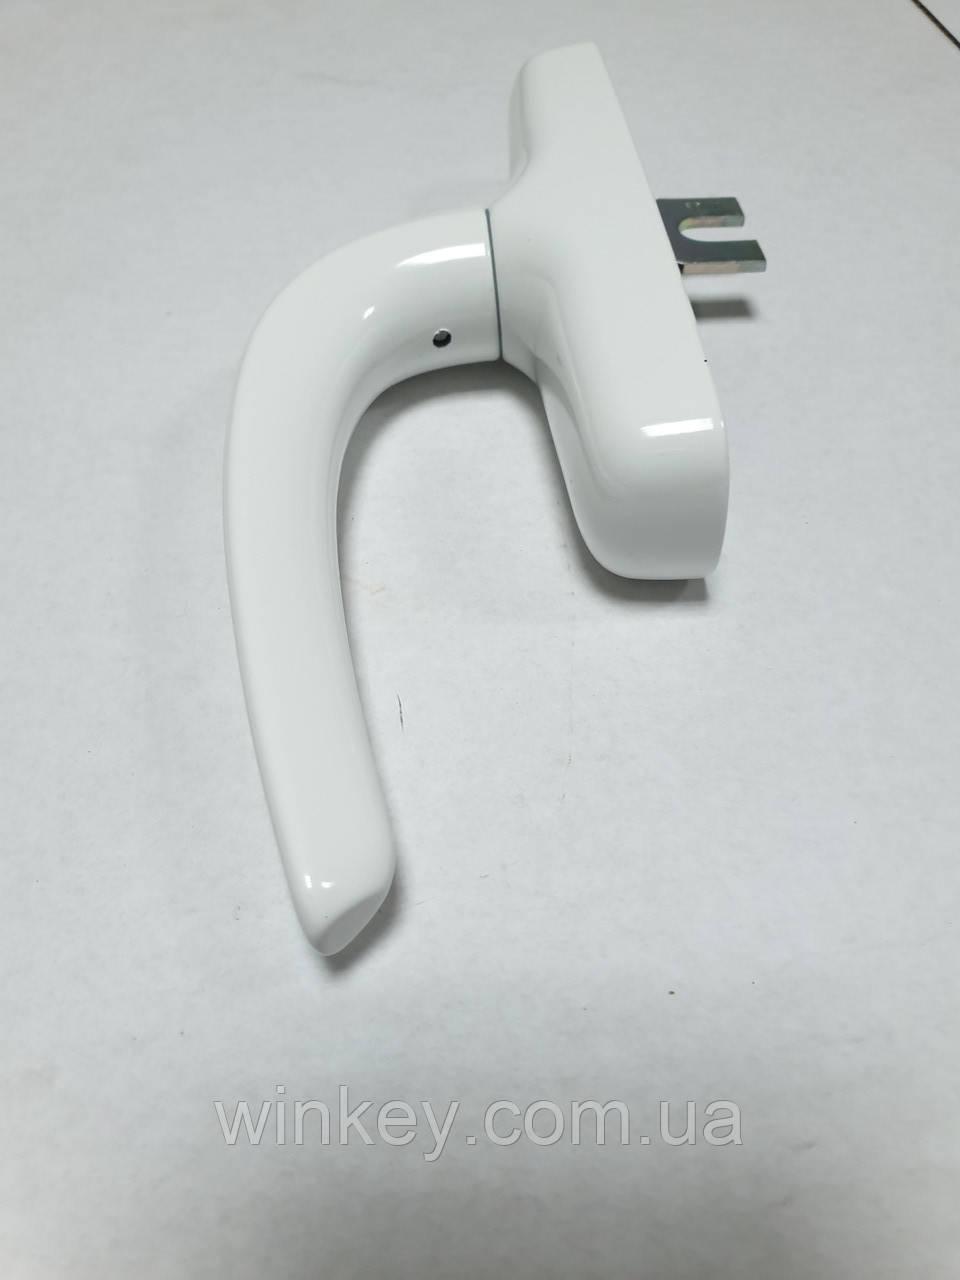 Ручка оконная FAPIM NEFER Midi 0757Ві белая для алюминиевых окон